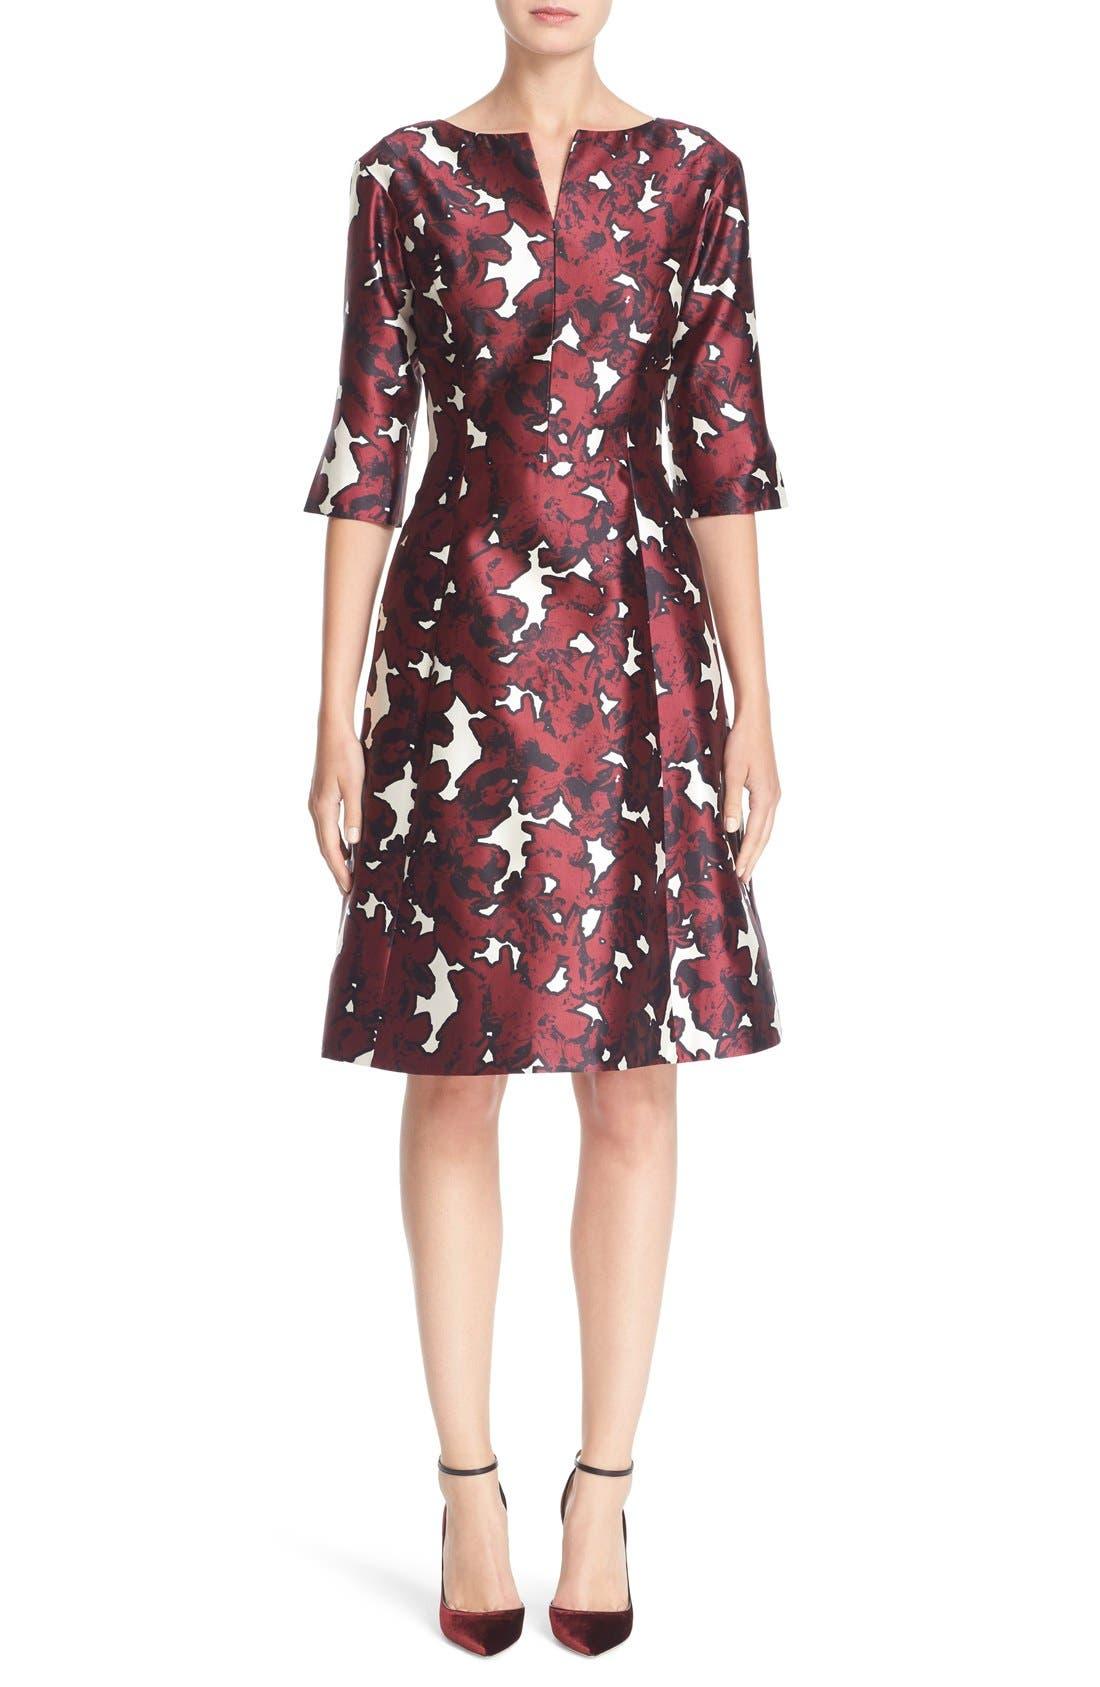 Alternate Image 1 Selected - Oscar de la Renta 'Pressed Flowers' Print Silk Mikado Dress